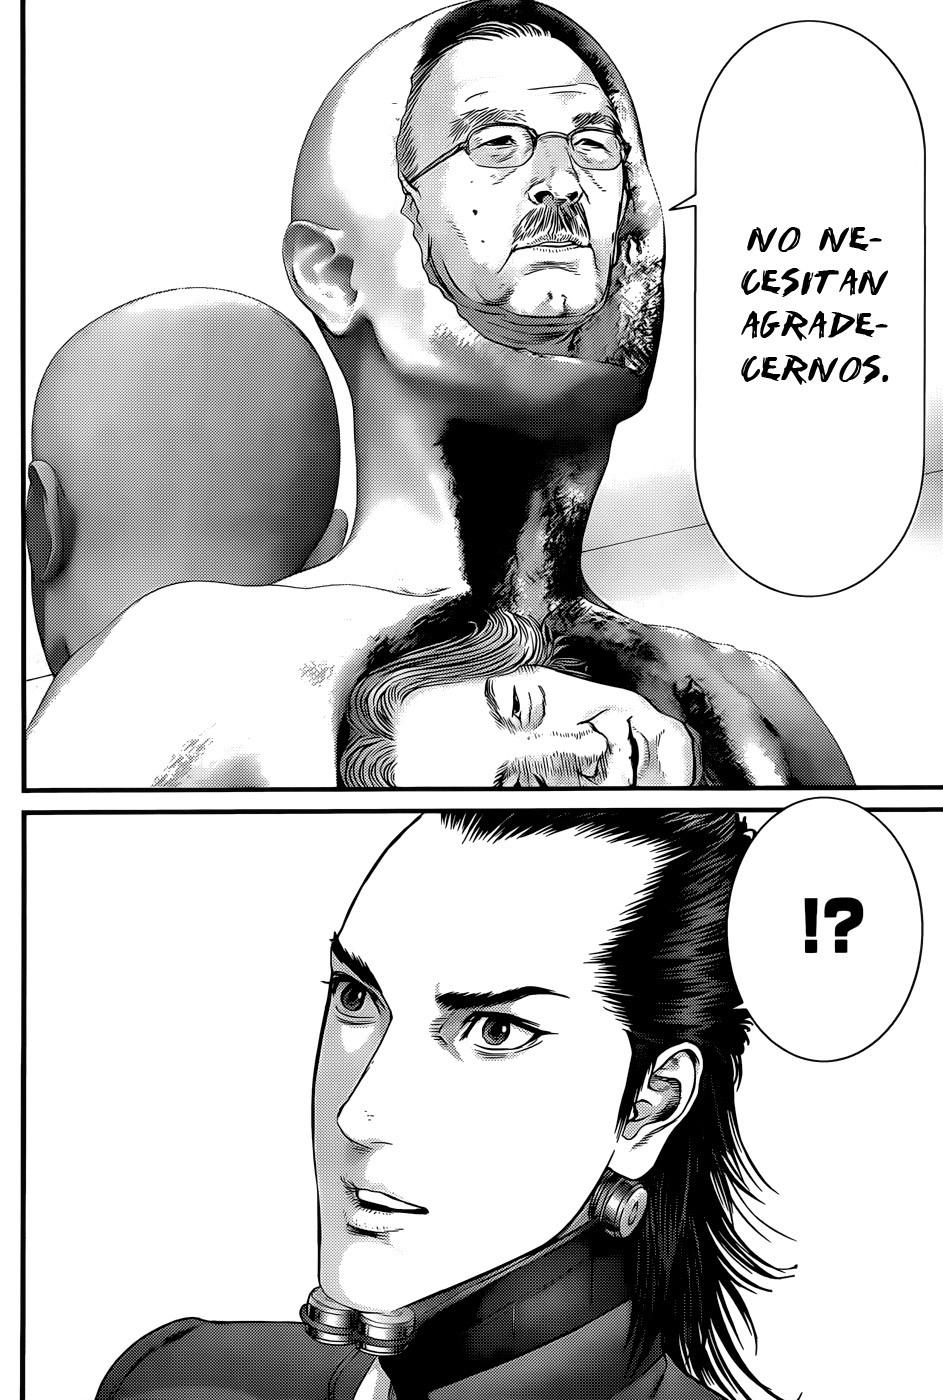 Manga Gantz capitulo 369 21